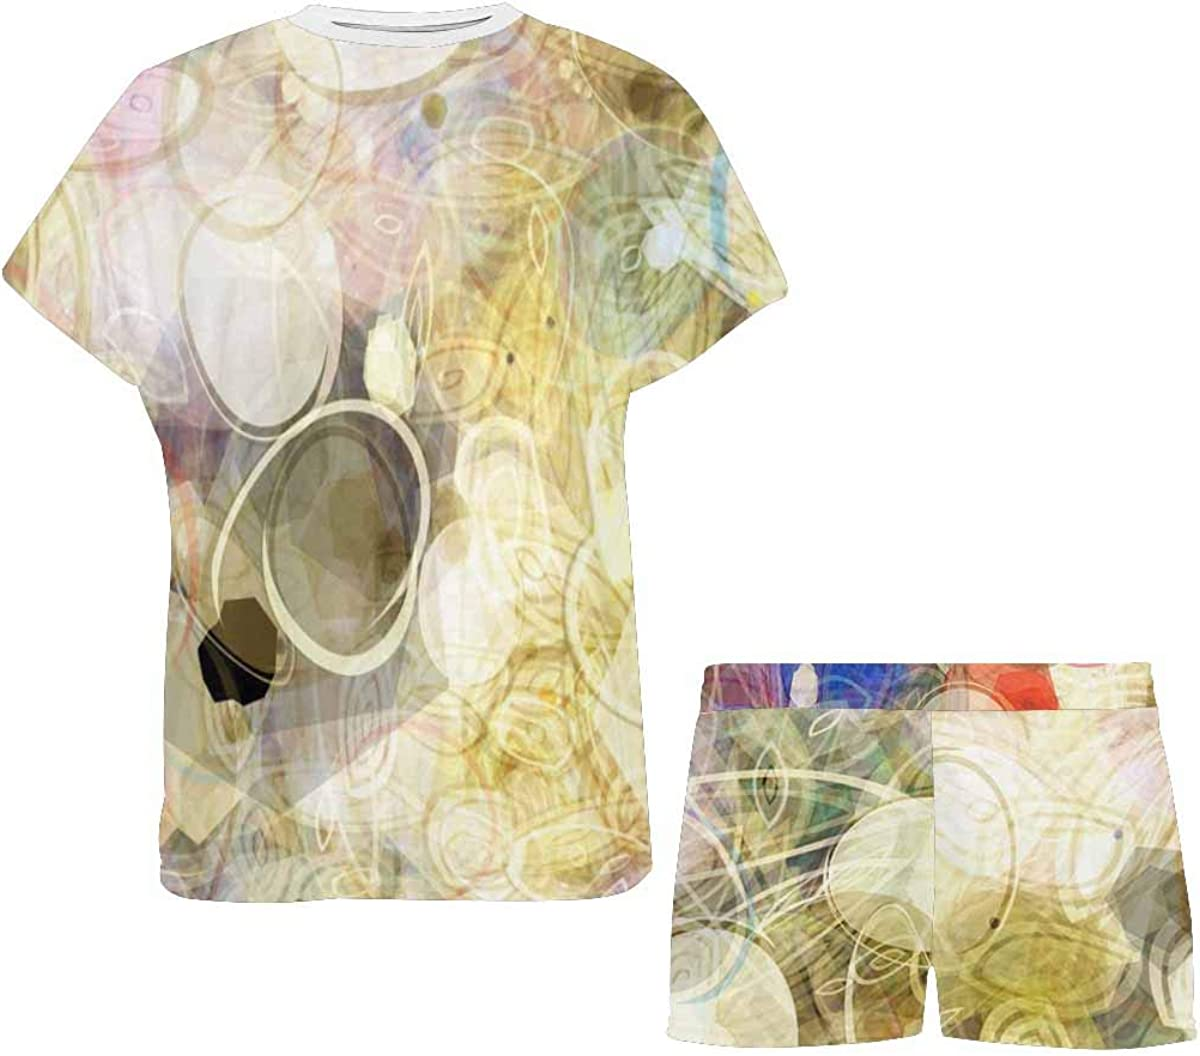 INTERESTPRINT Abstract Painting Pattern Women's Pajamas Short Sets Round Neck Short Sleeve Sleepwear